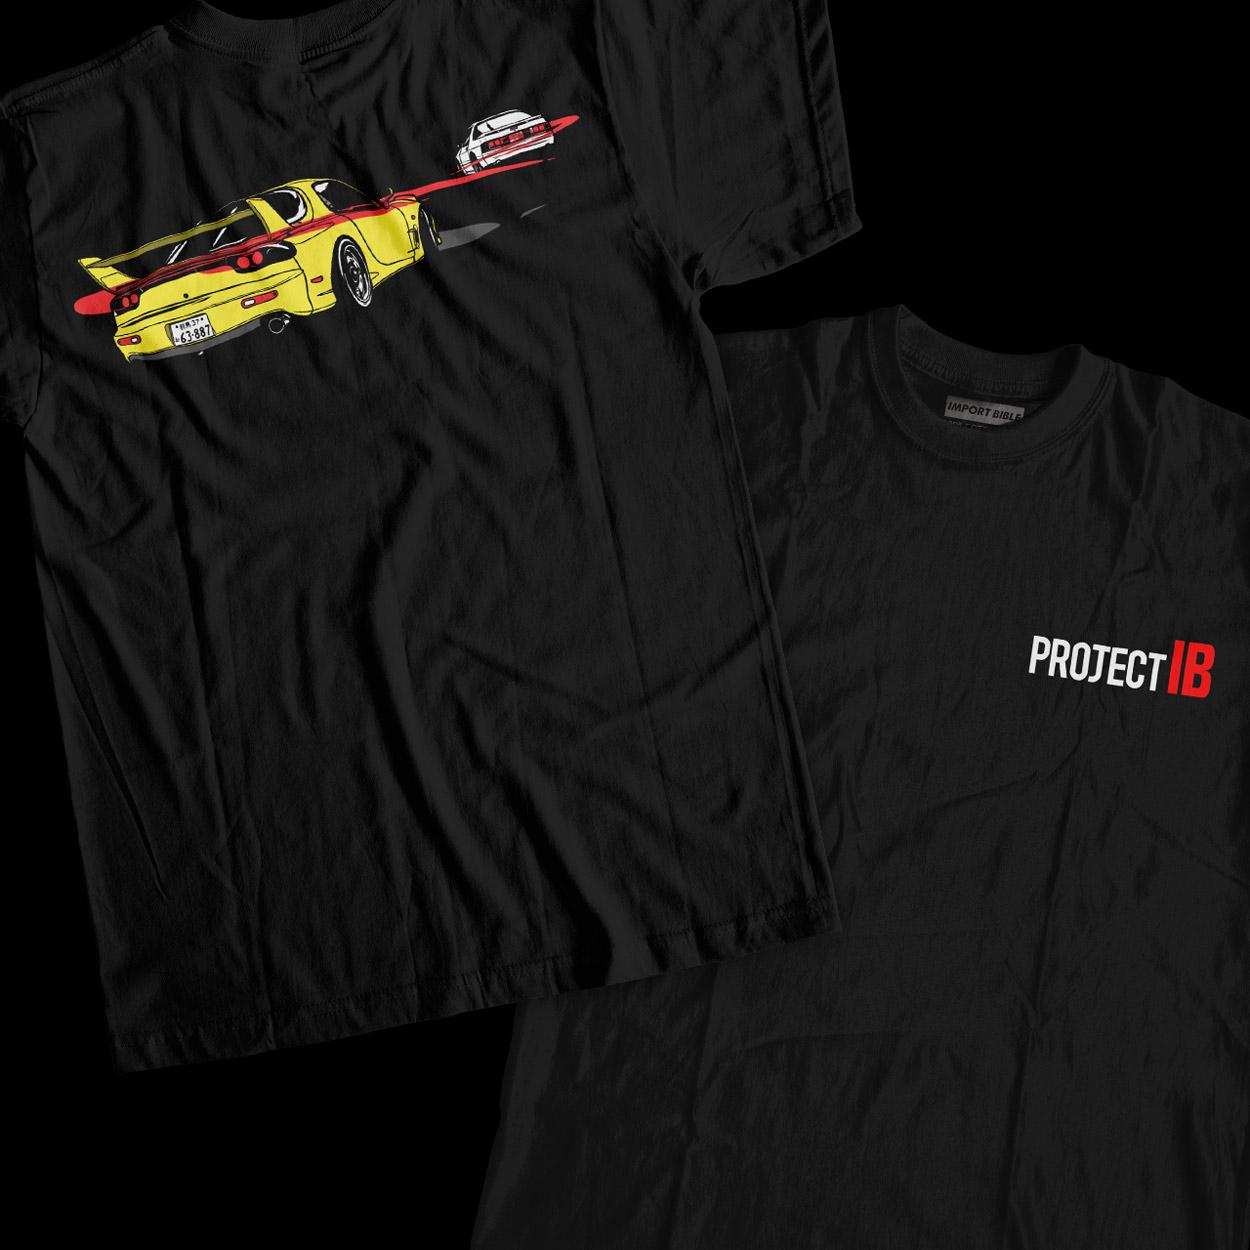 Project IB (RedSuns) Shirt